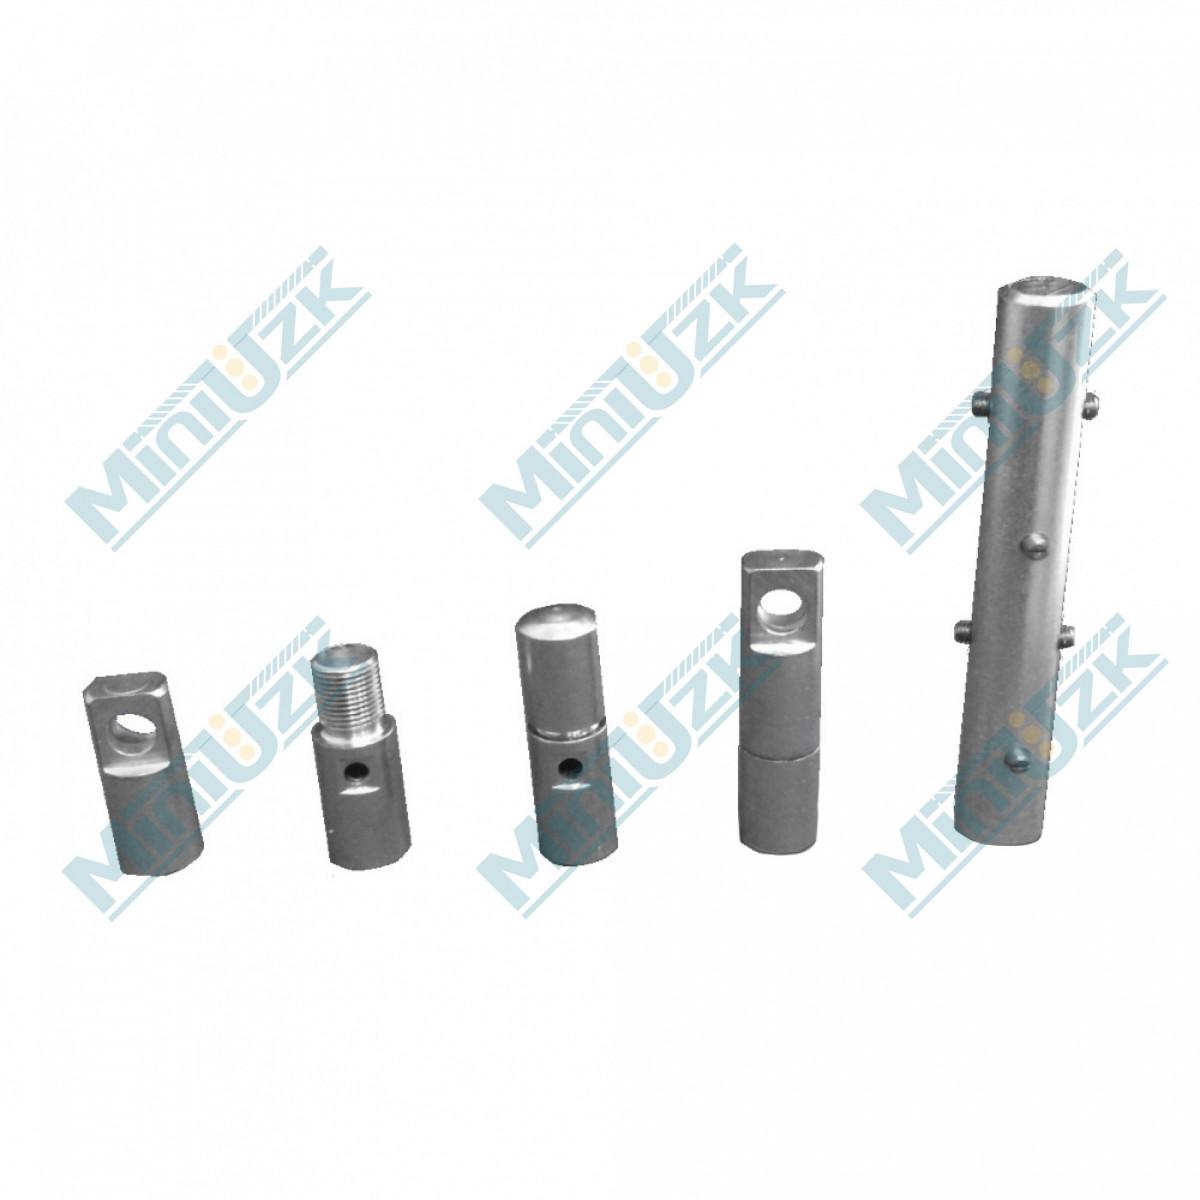 Устройство закладки кабеля (УЗК) OlmiOn СП-Т1-9/150